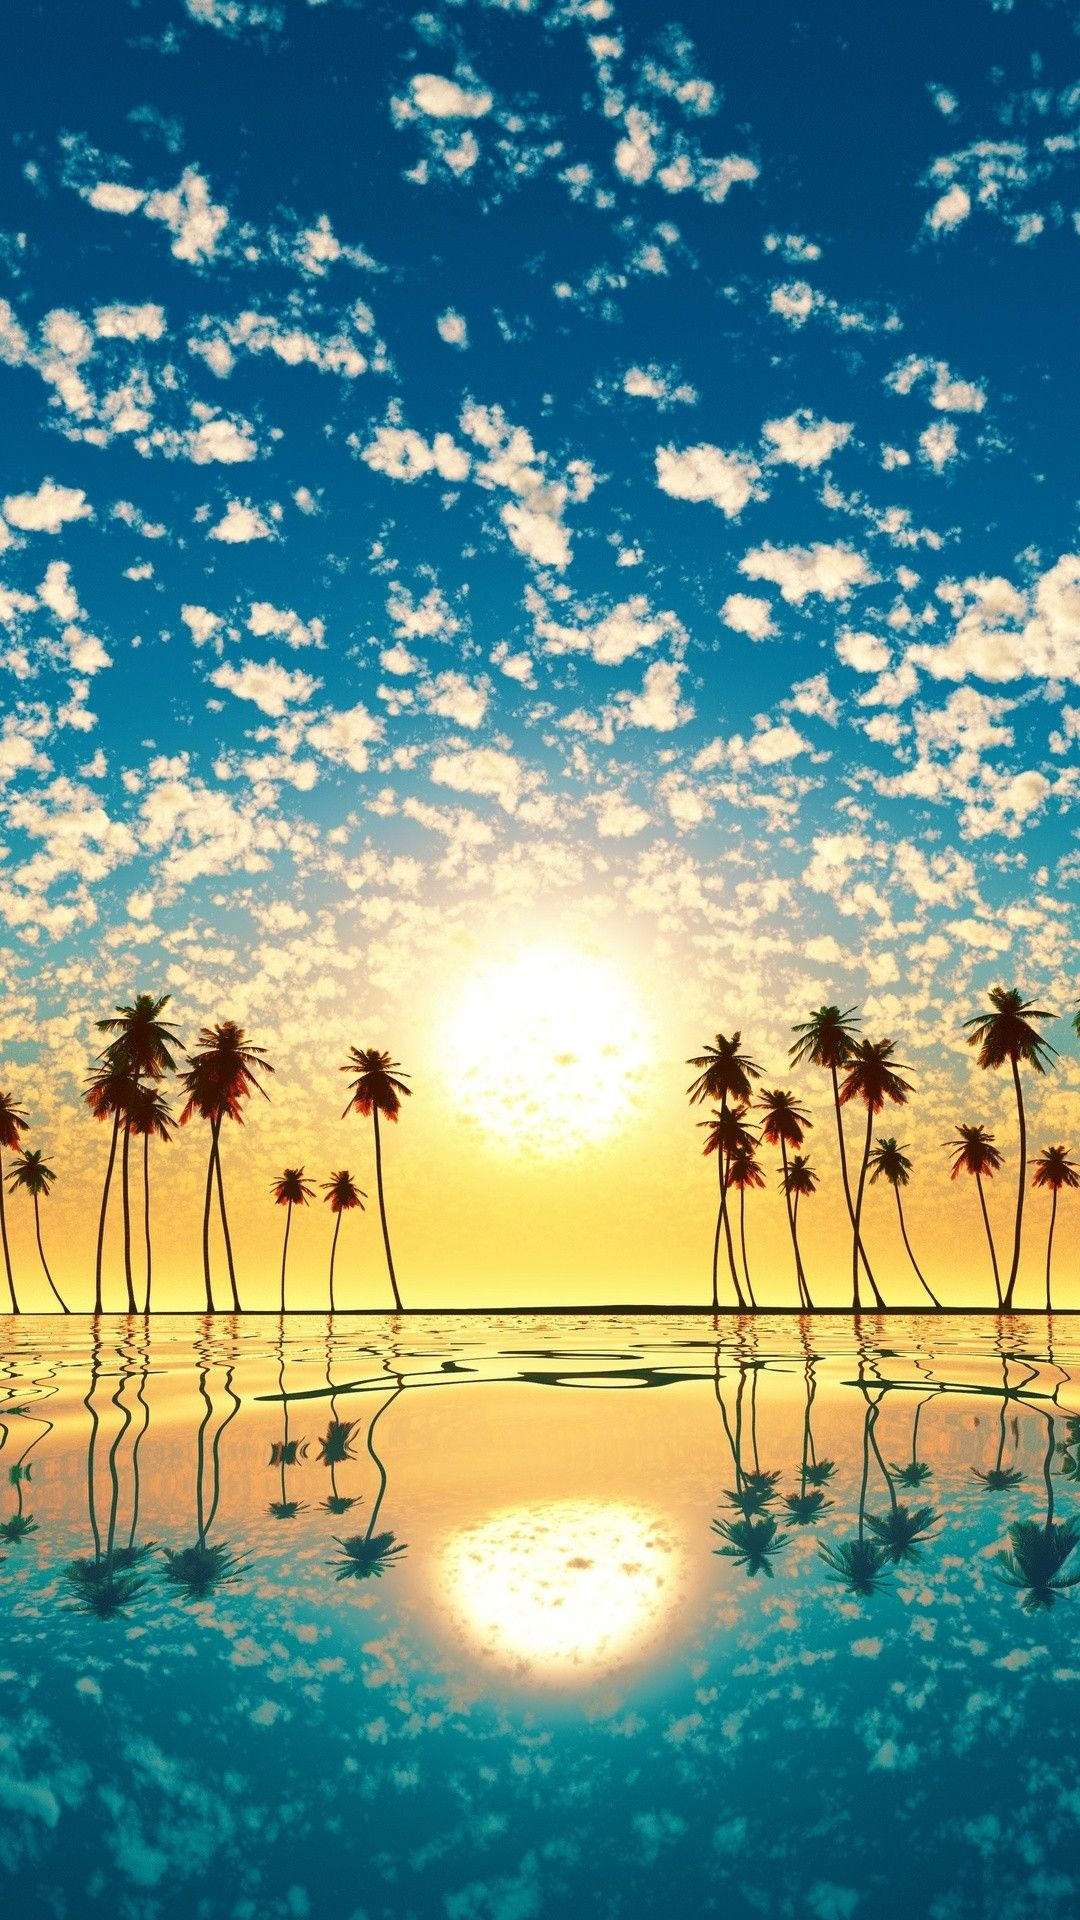 Image by Rocha Rocha on Random S**T Sunset wallpaper